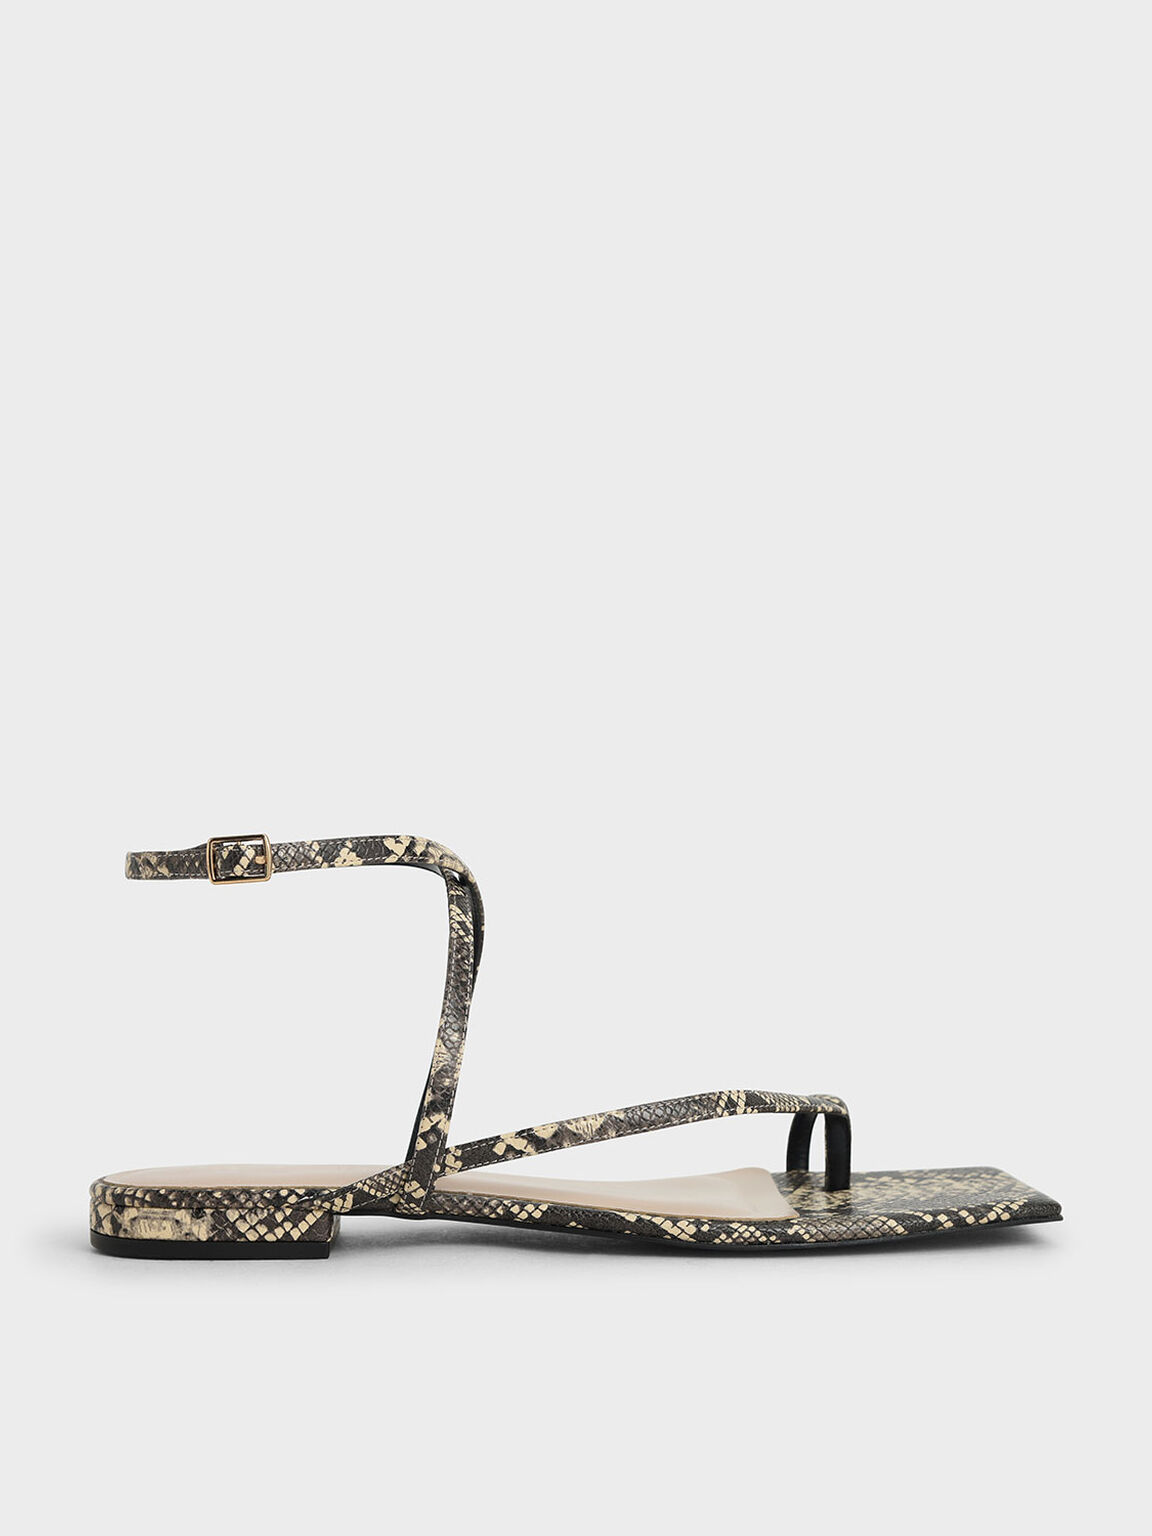 蛇紋斜帶趾環涼鞋, 原色動物紋, hi-res